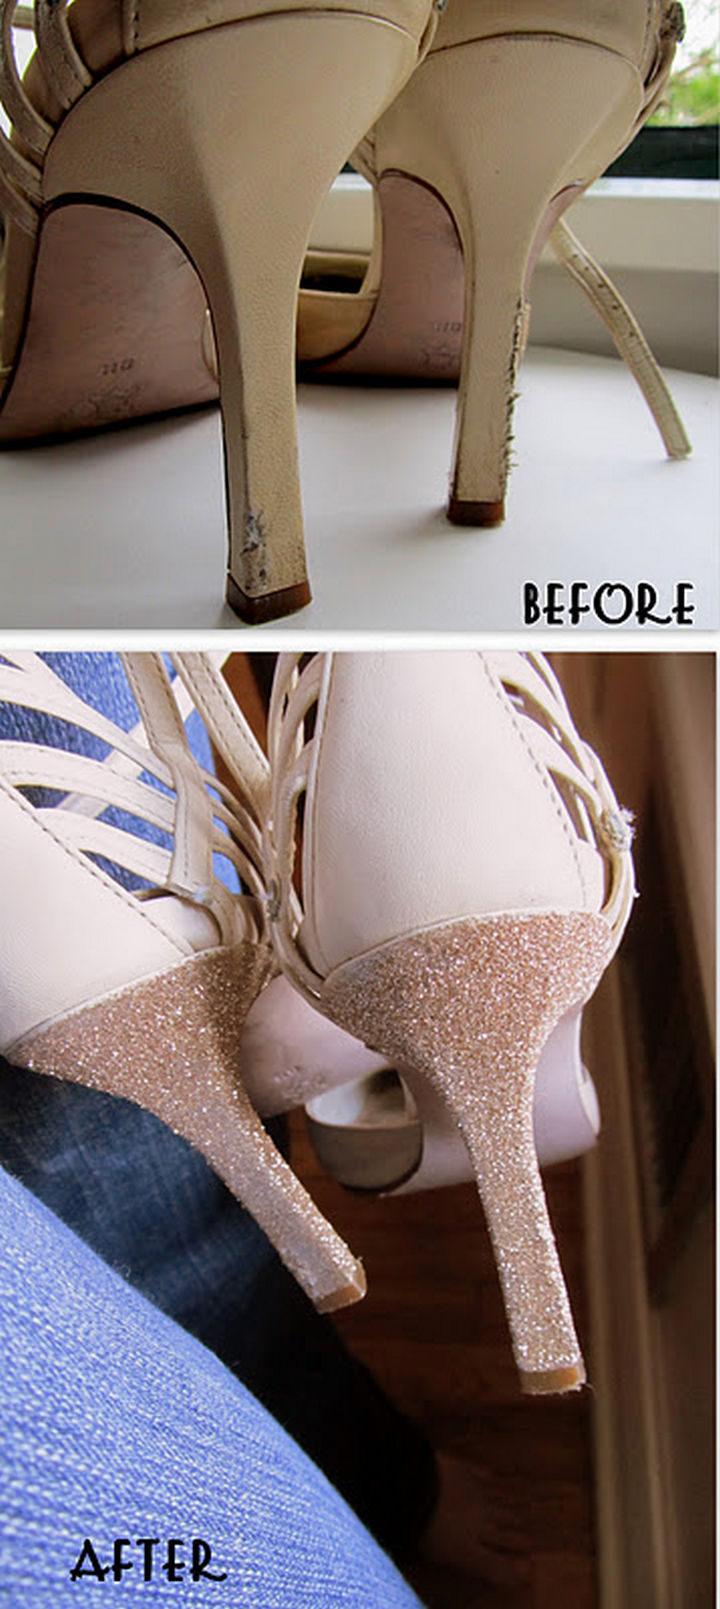 22 Kickass Life Hacks for Girls - Give worn heels a new look.